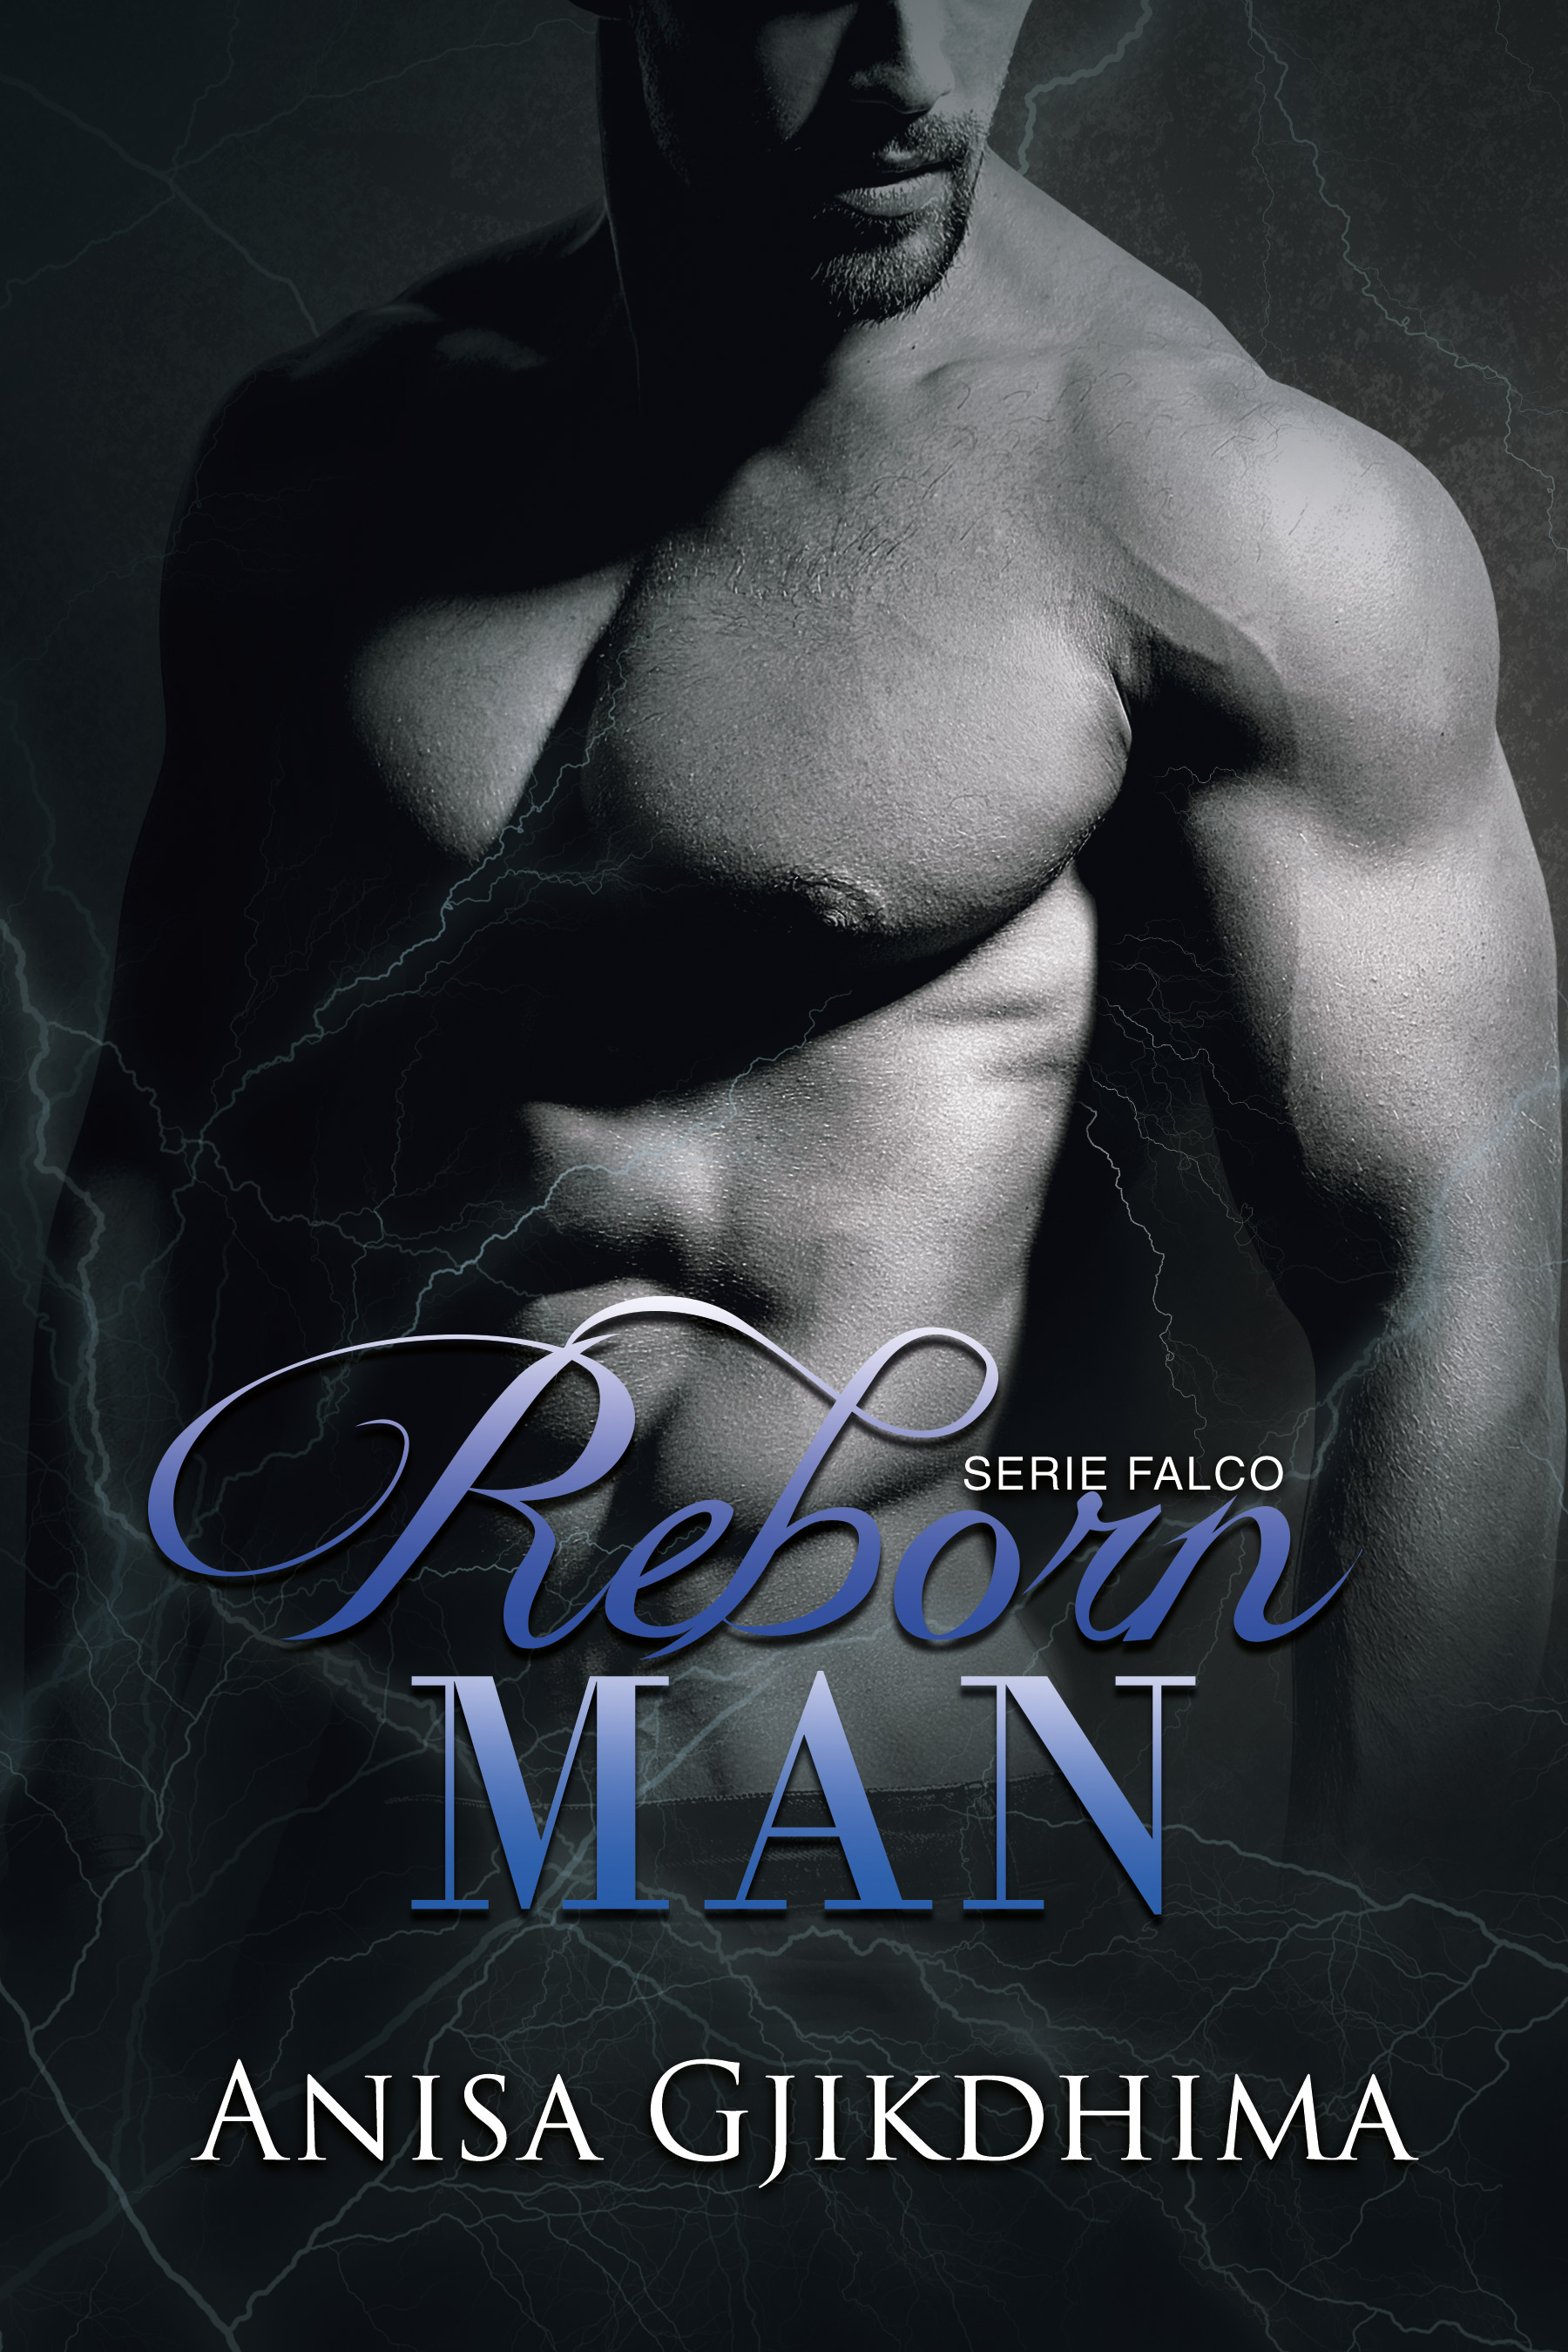 Reborn Man